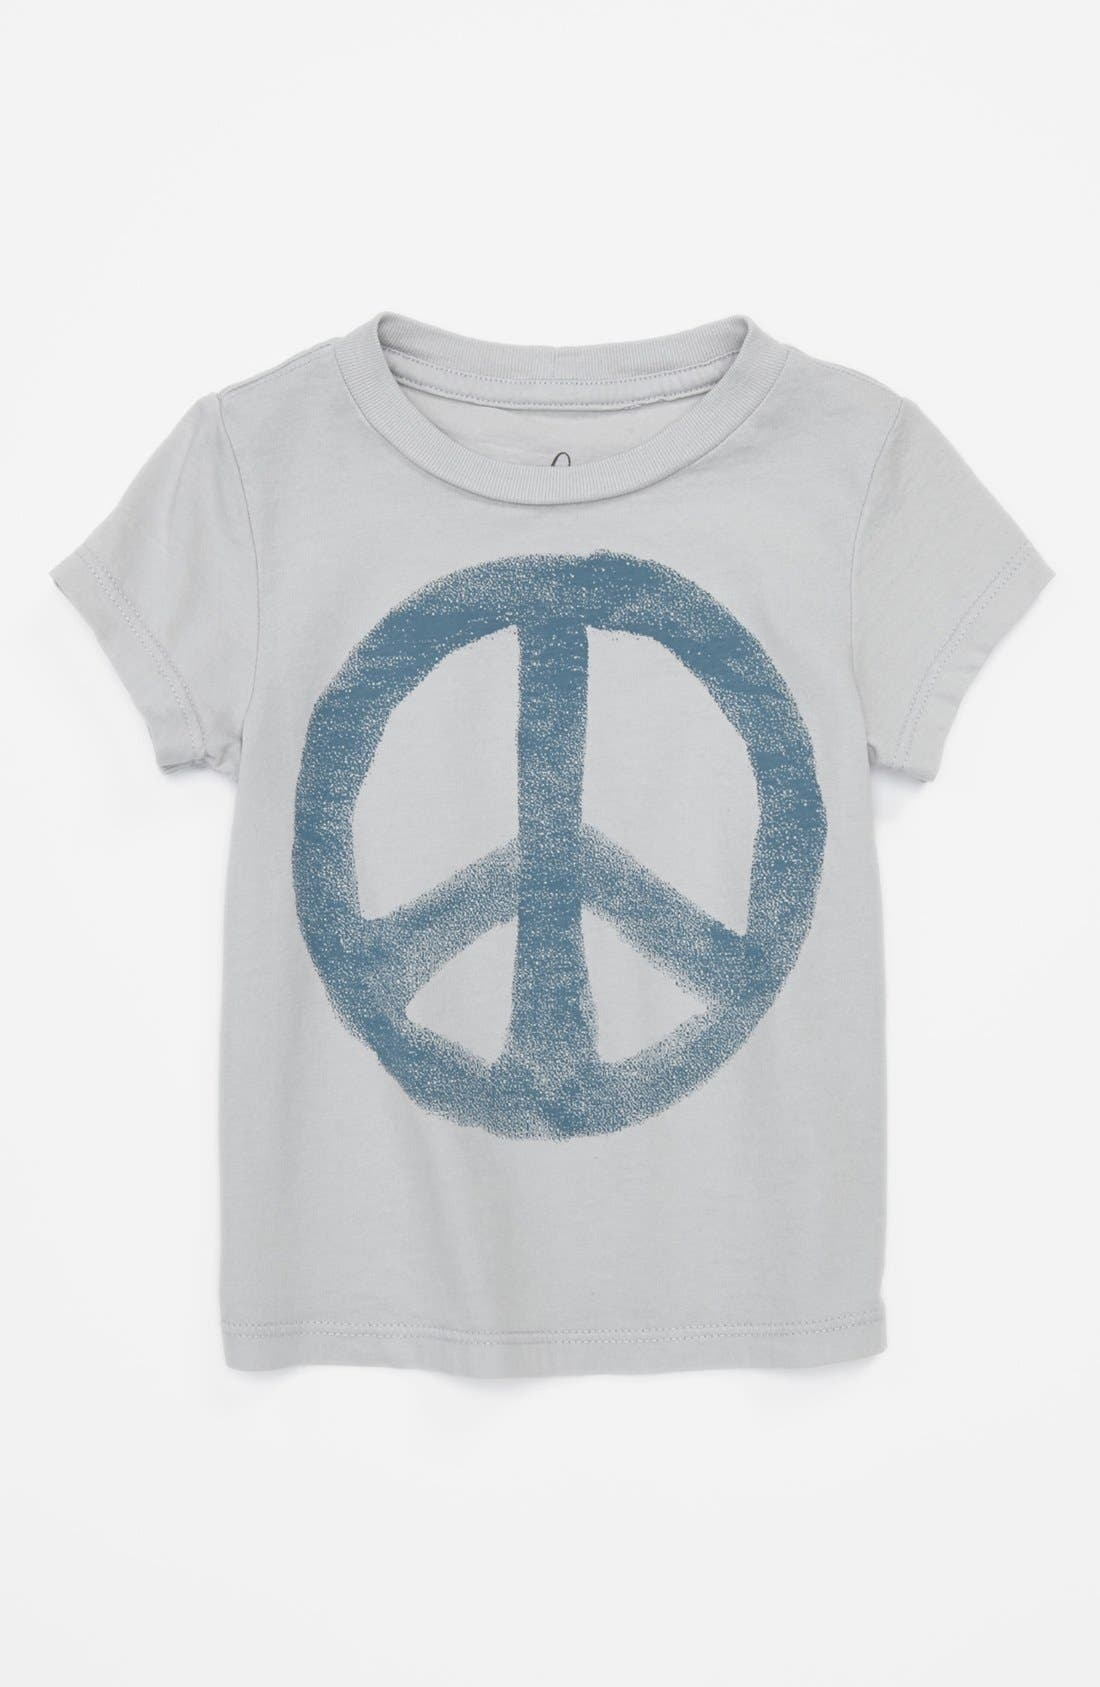 Alternate Image 1 Selected - Peek 'Peace - Little Peanut' T-Shirt (Baby Boys)